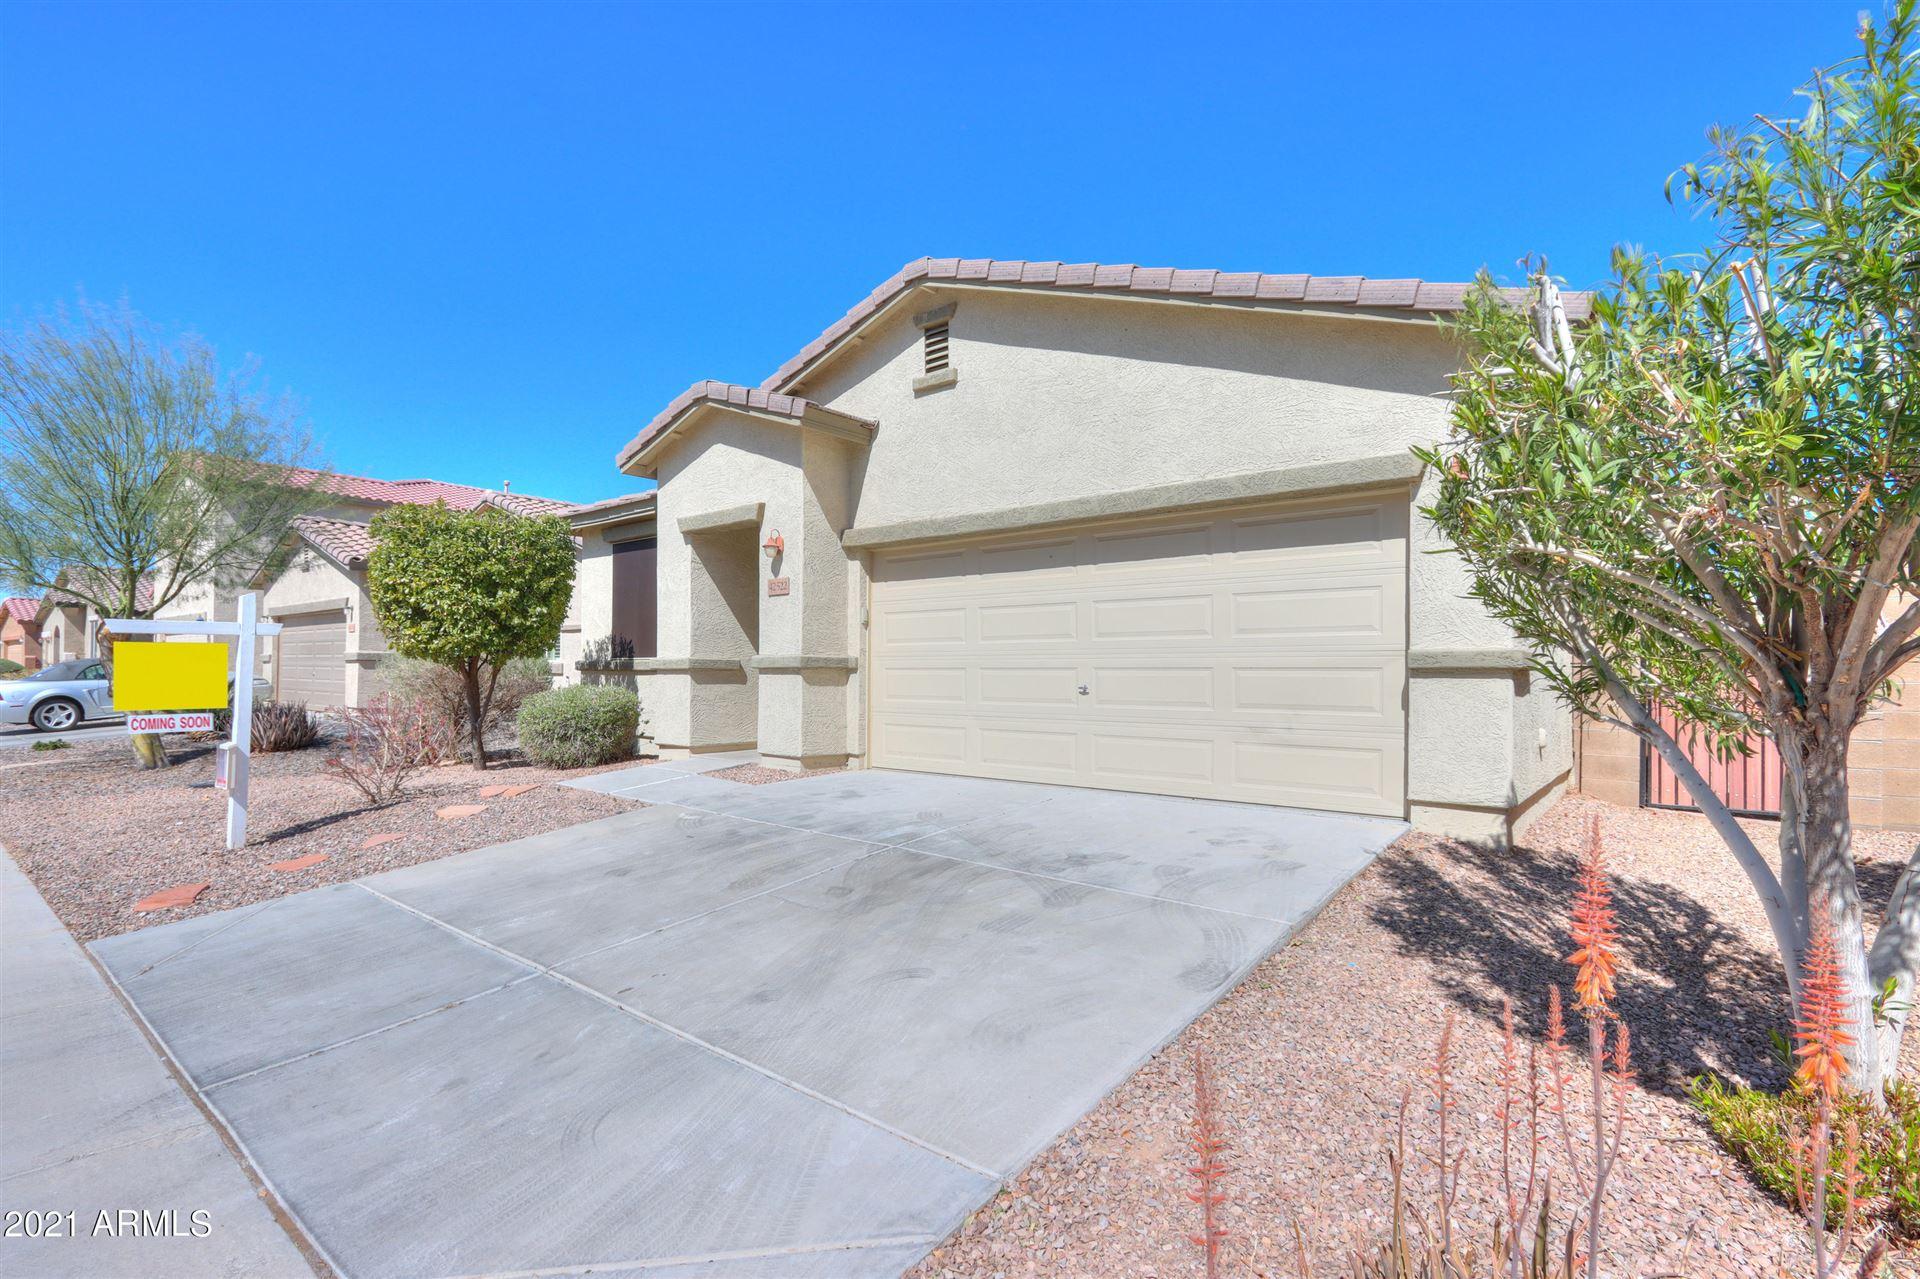 Photo of 42522 W ROSALIA Drive, Maricopa, AZ 85138 (MLS # 6202139)